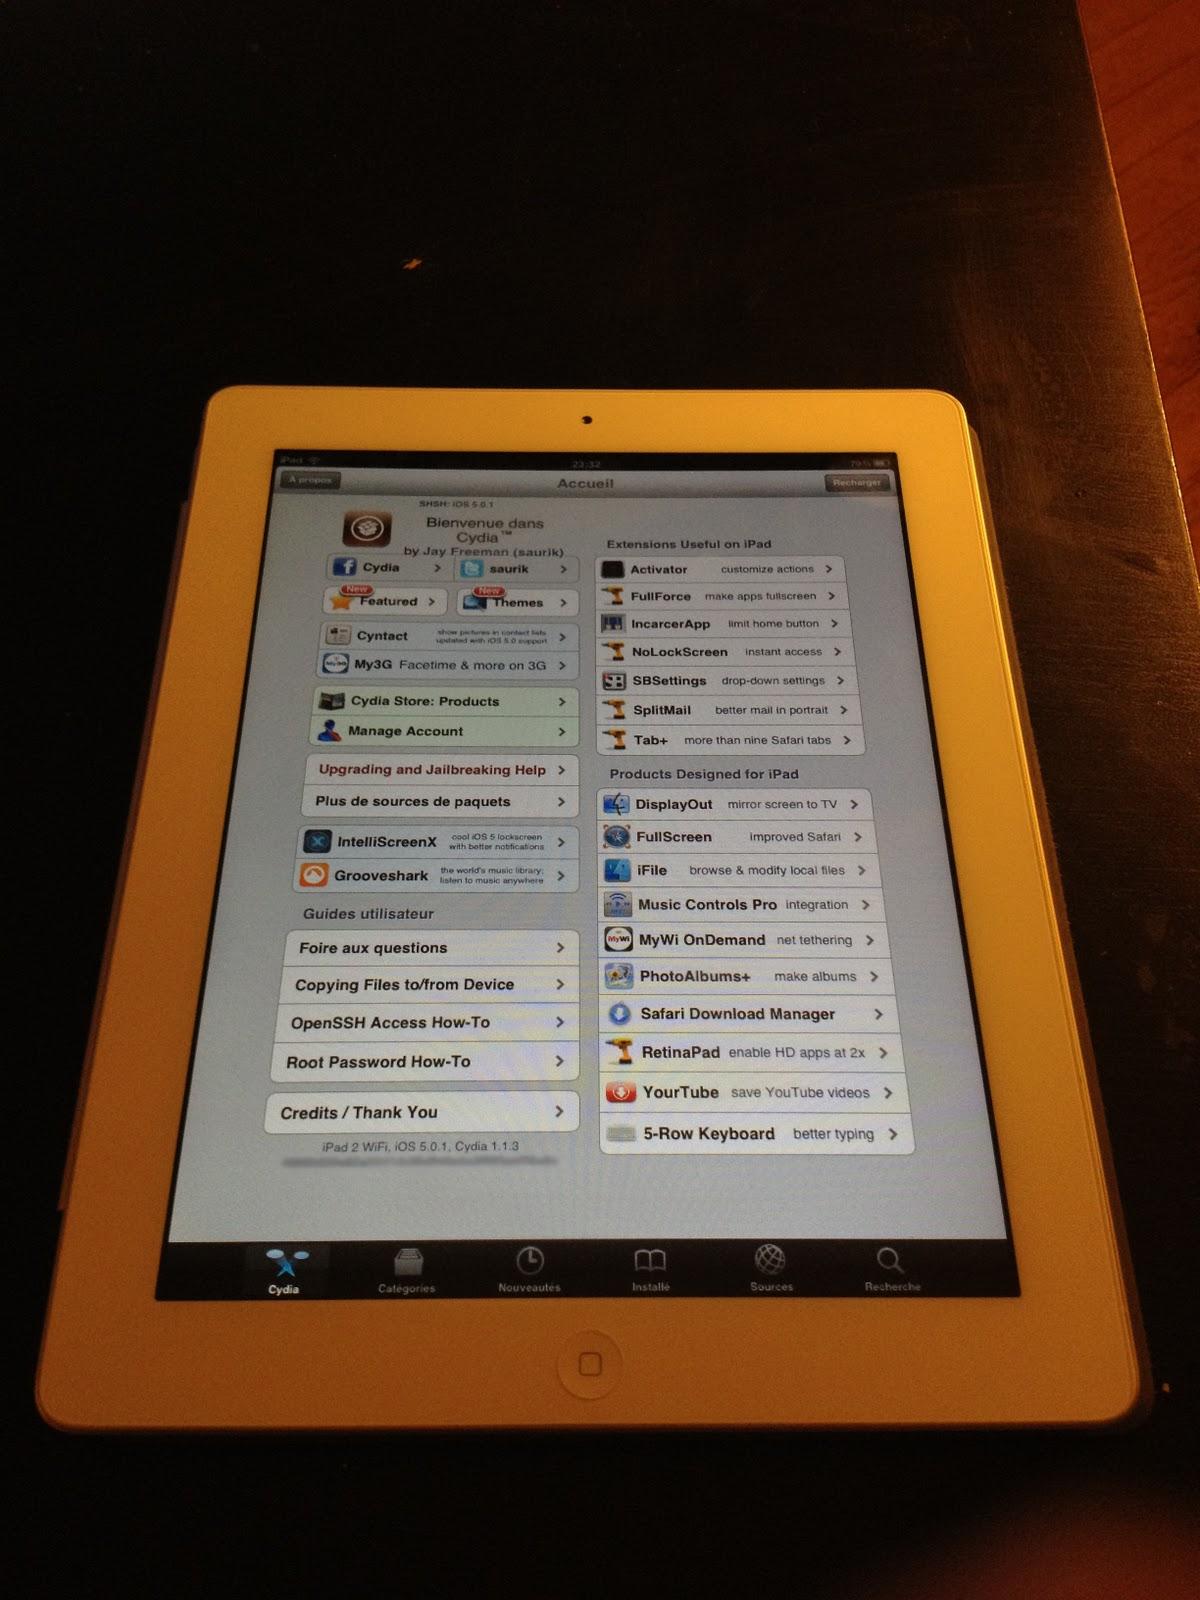 iPad 2 Jailbreak untethered screenshoot